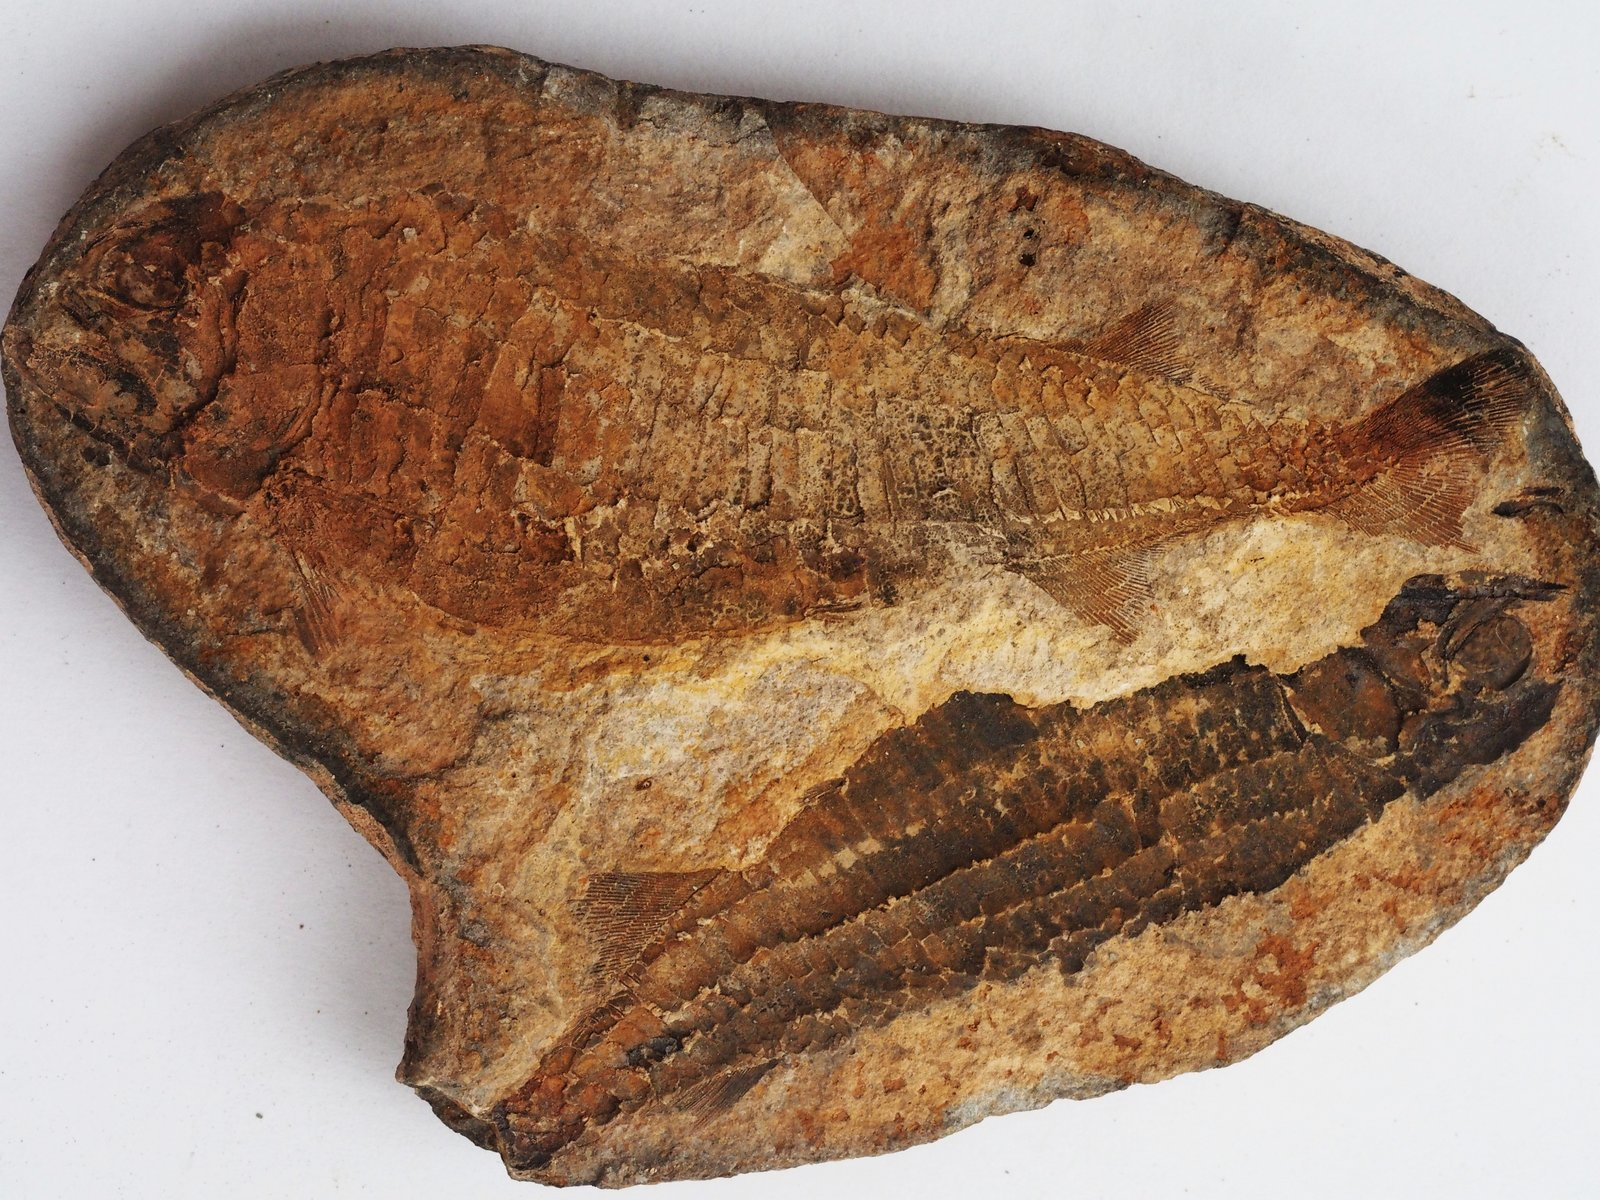 Australosomus merlei Piveteau, 1934